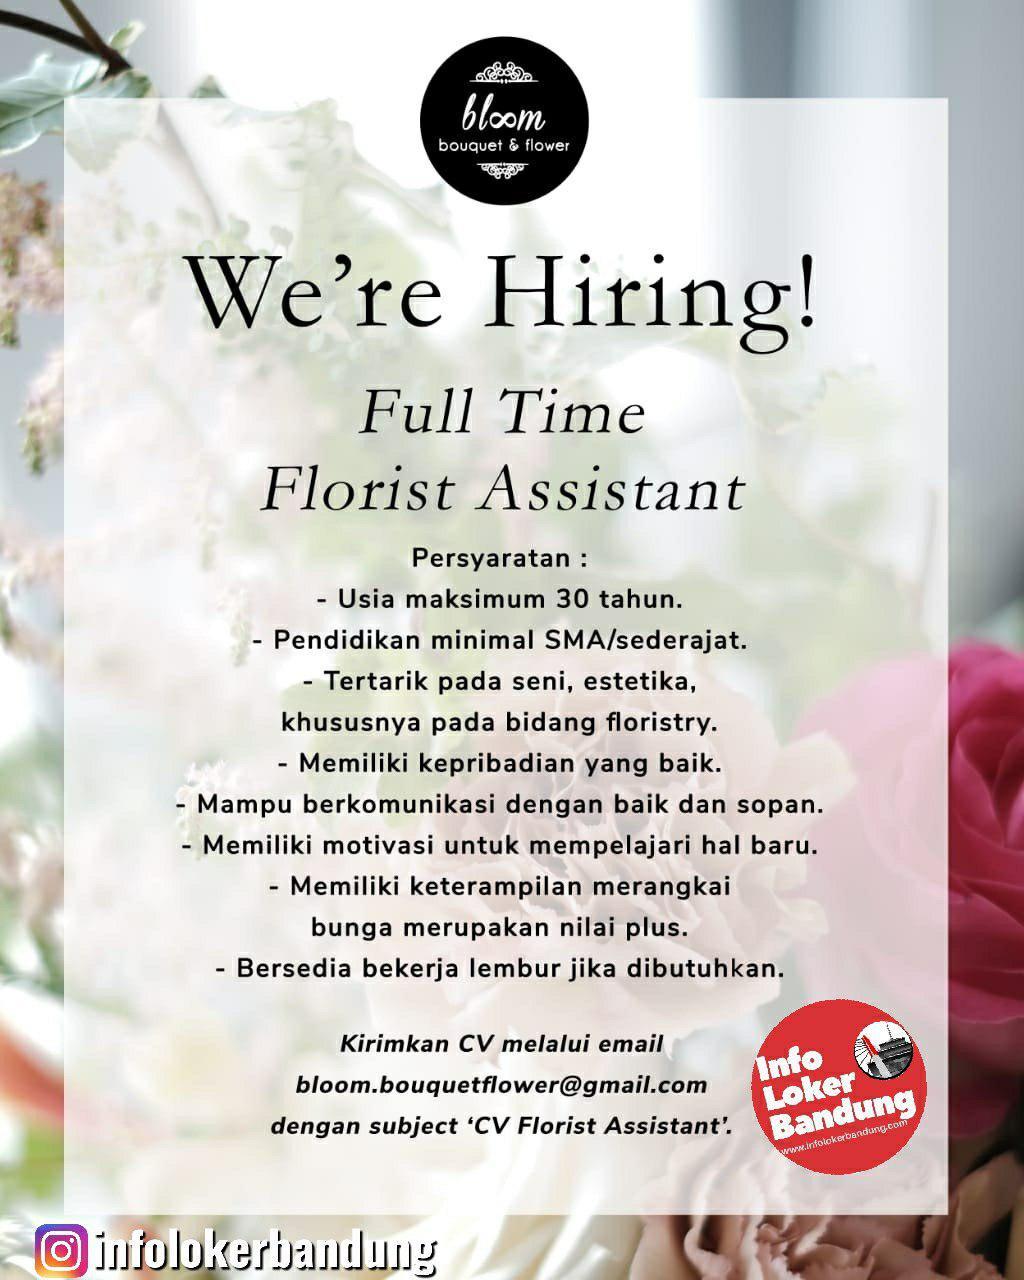 Lowongan Kerja Florist Assistant Bloom Bouquet & Flower Bandung Agustus 2019